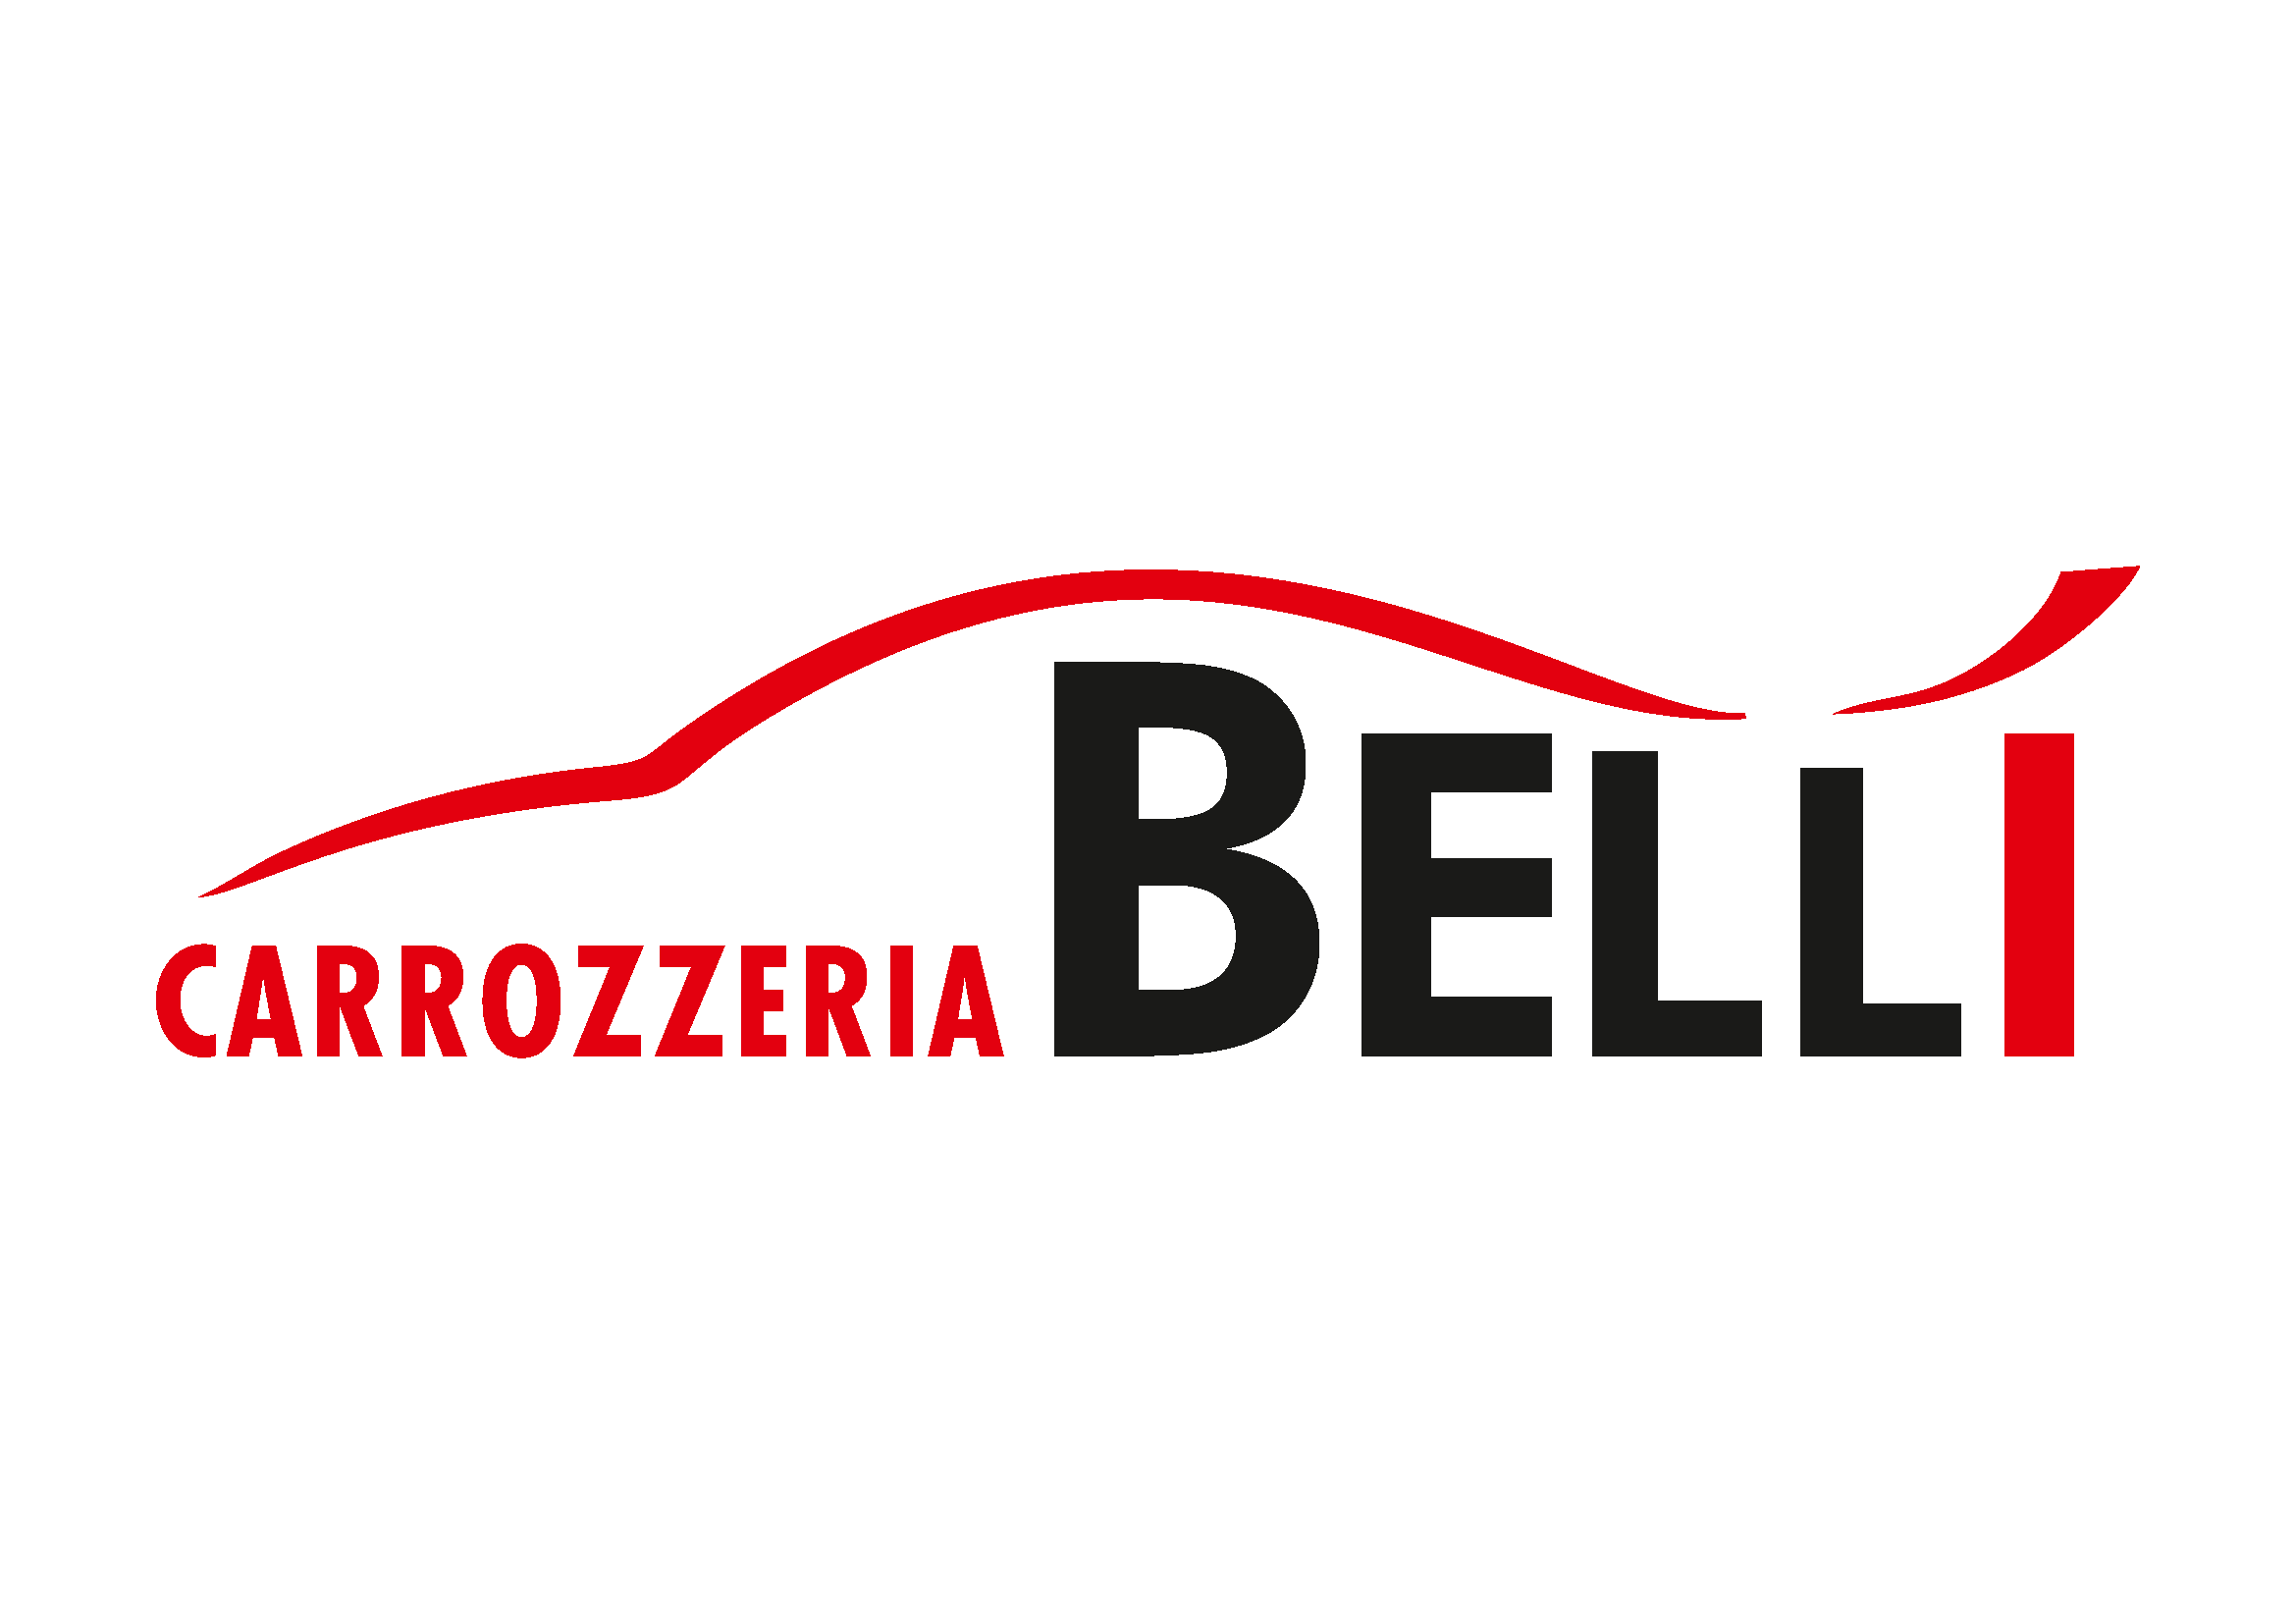 Carrozzeria Belli